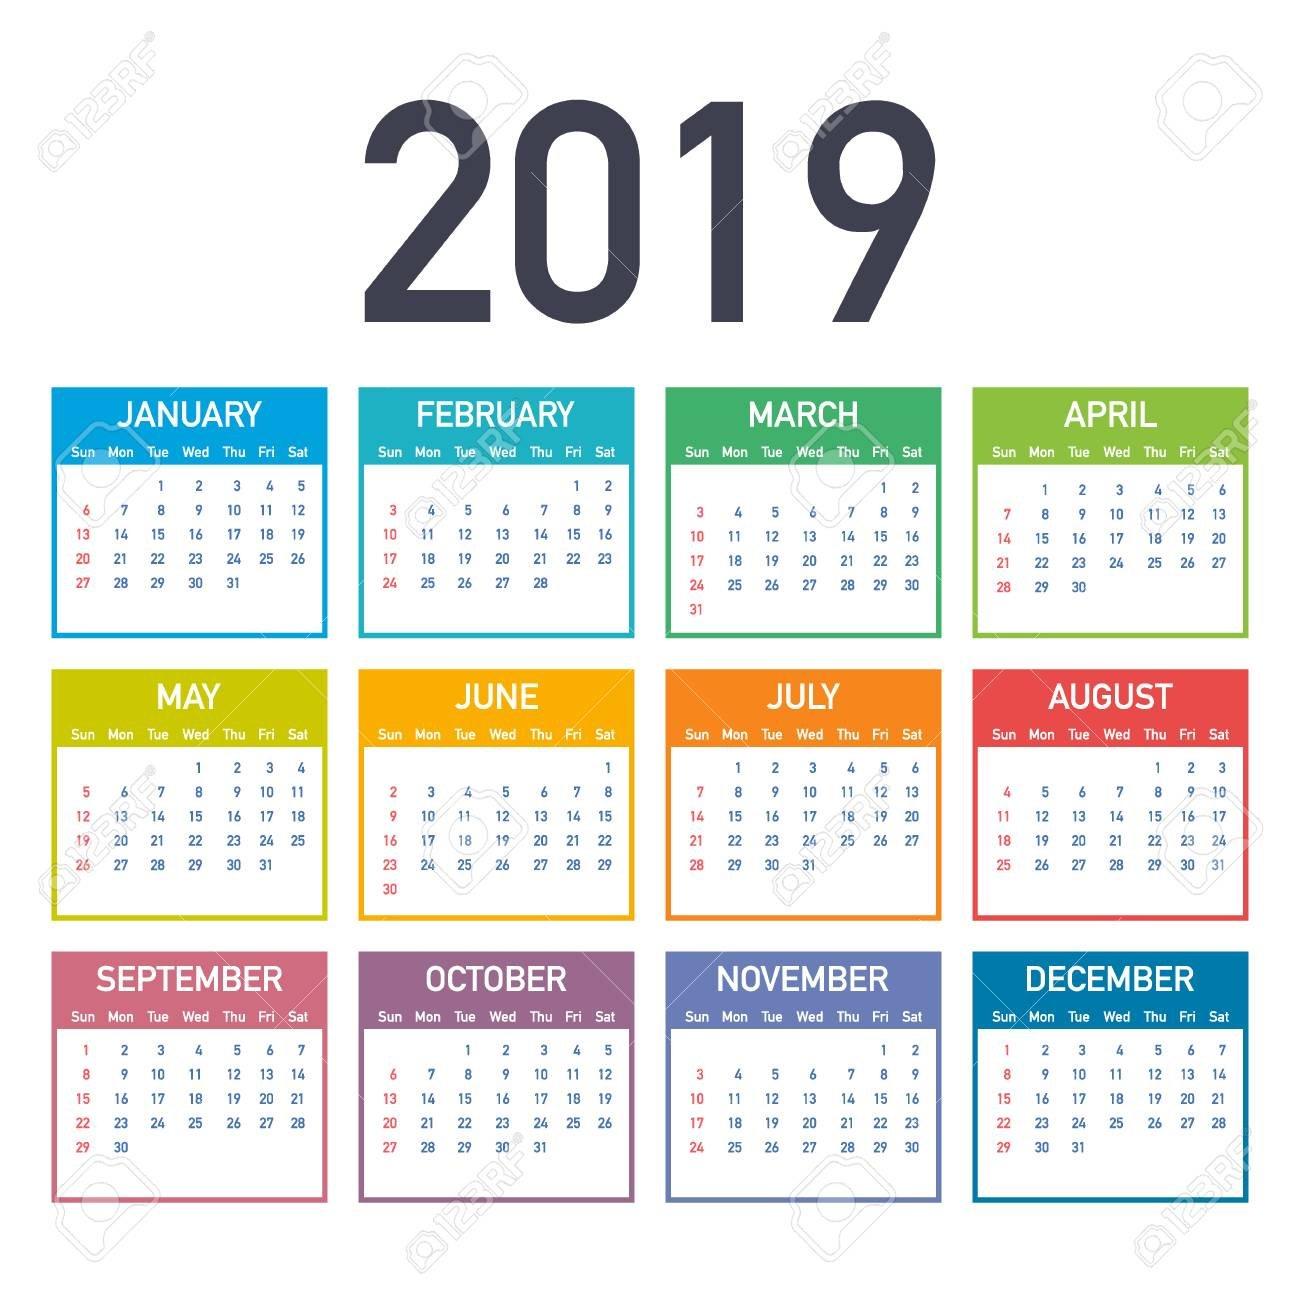 Calendar 2019, Week Starts From Sunday, Business Template. Editable Calendar 2019 For Business